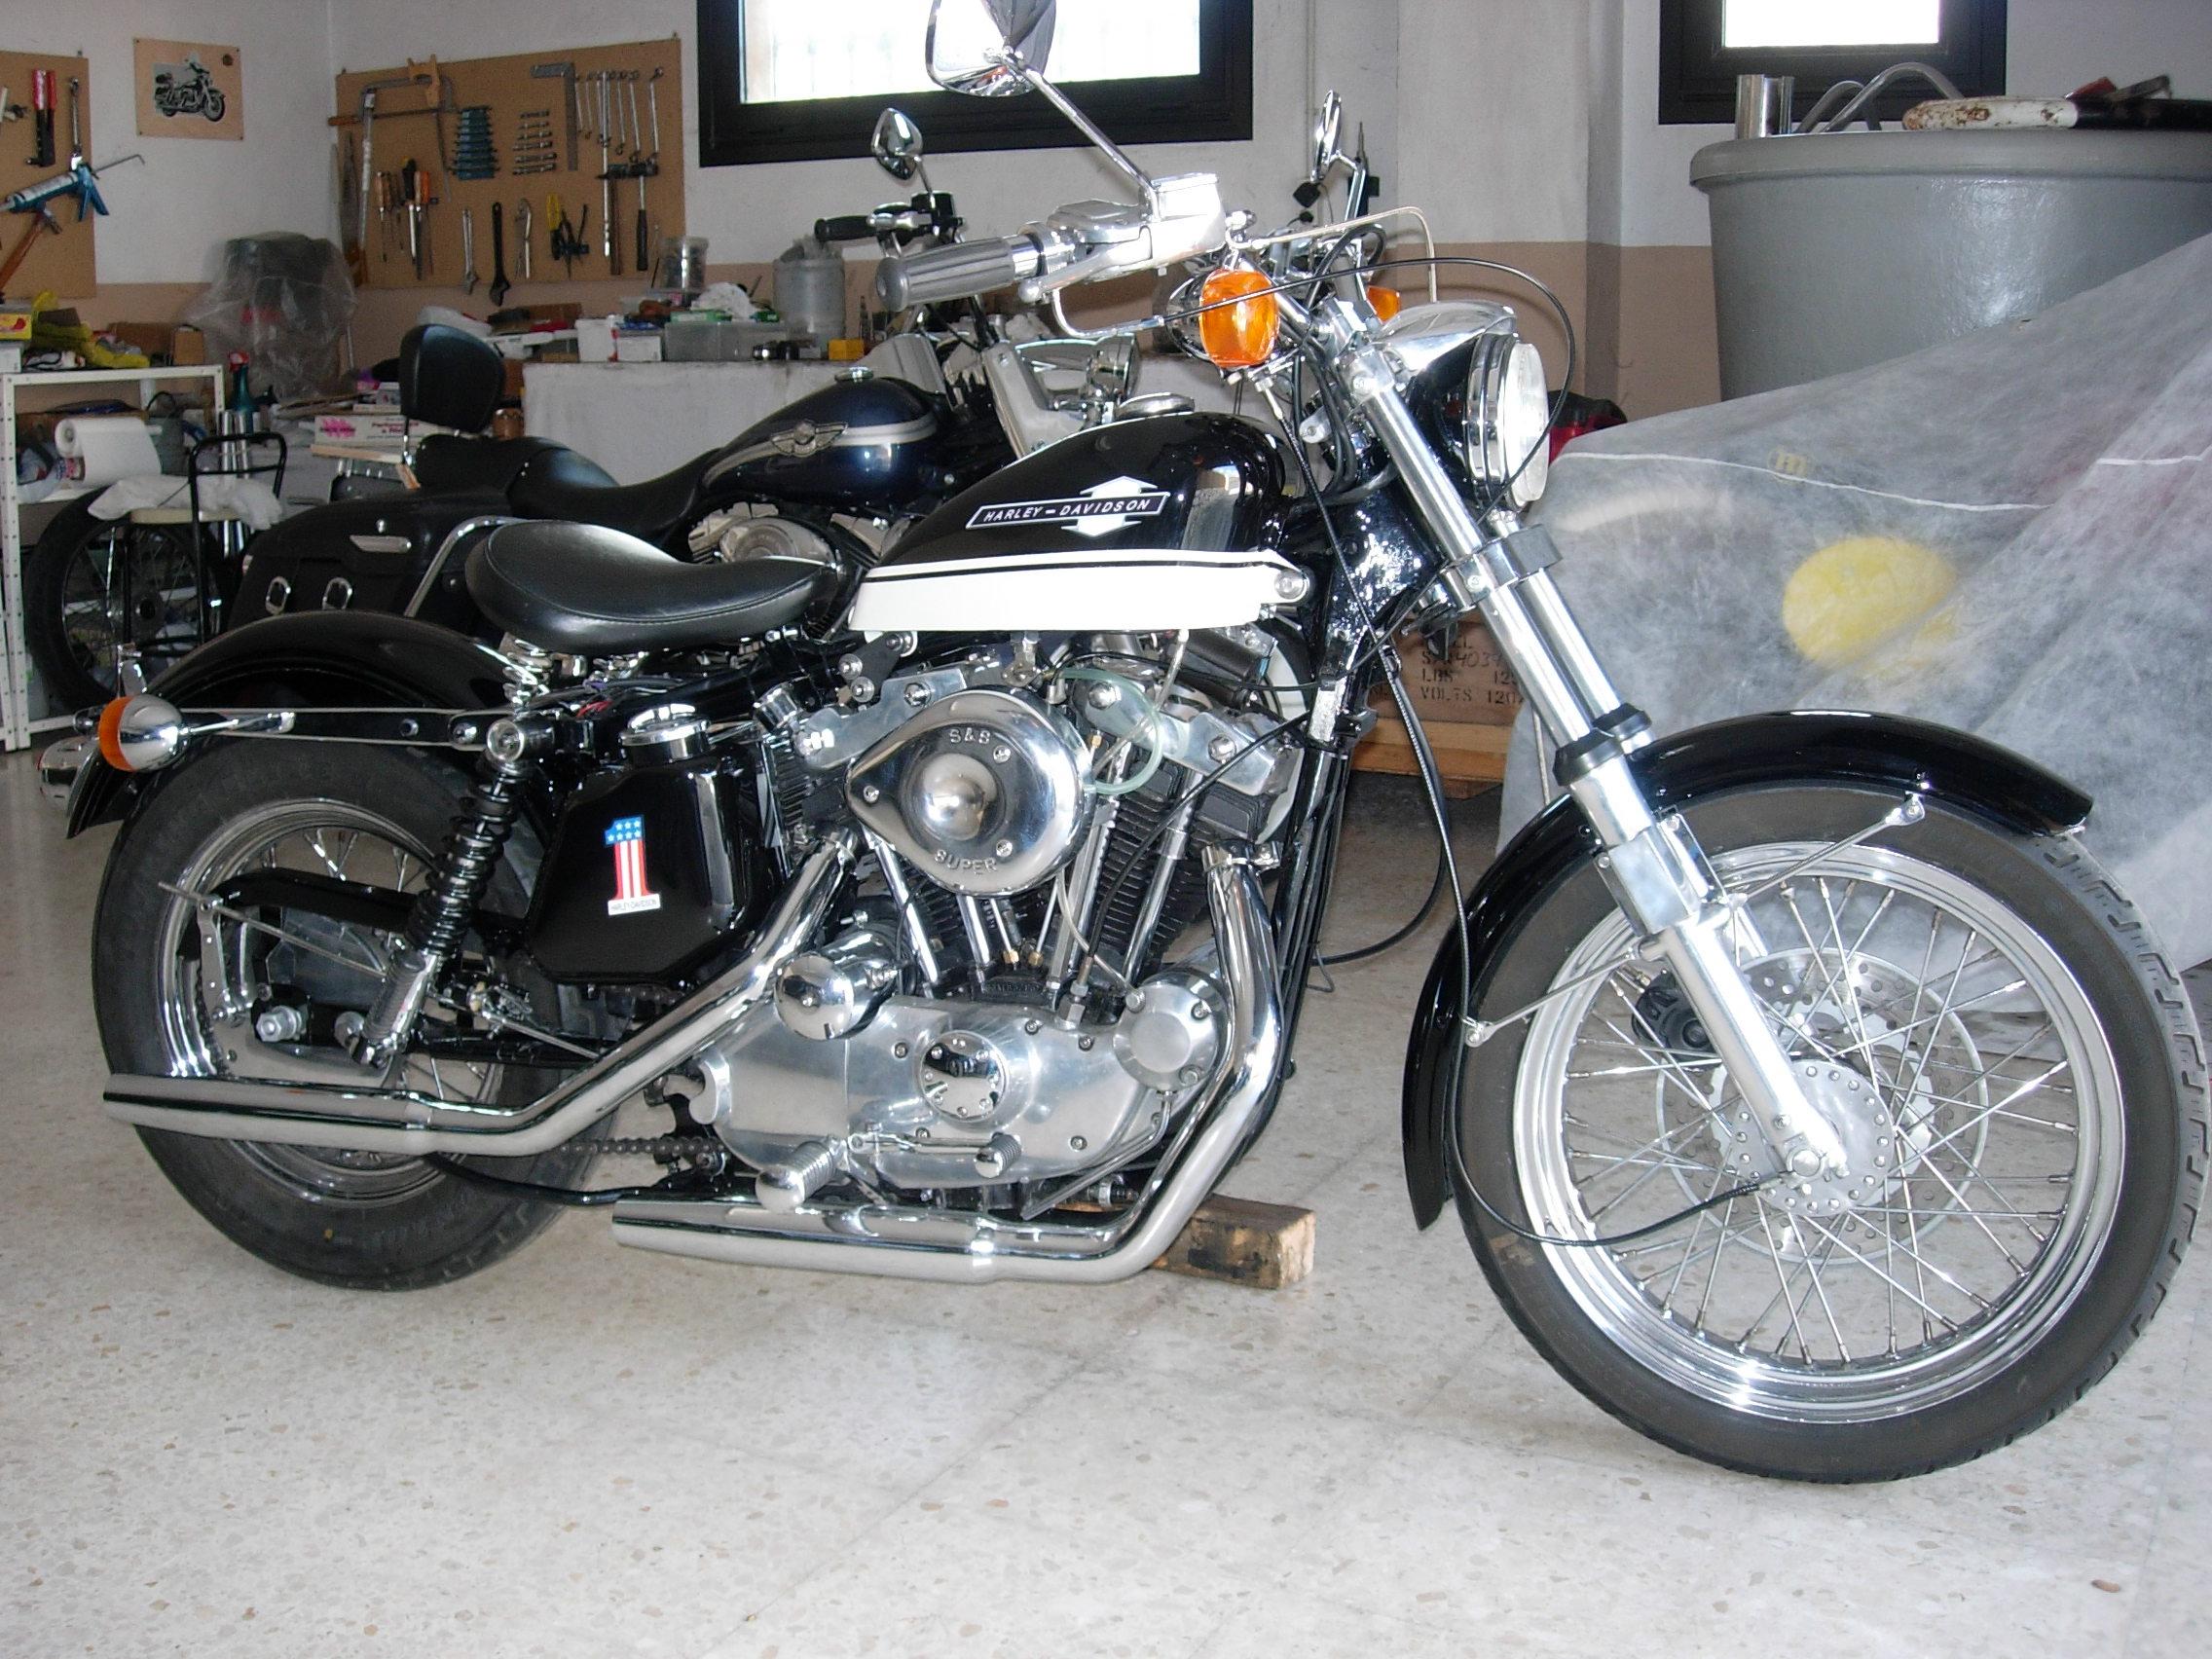 Harley Davidson XLH de 1977